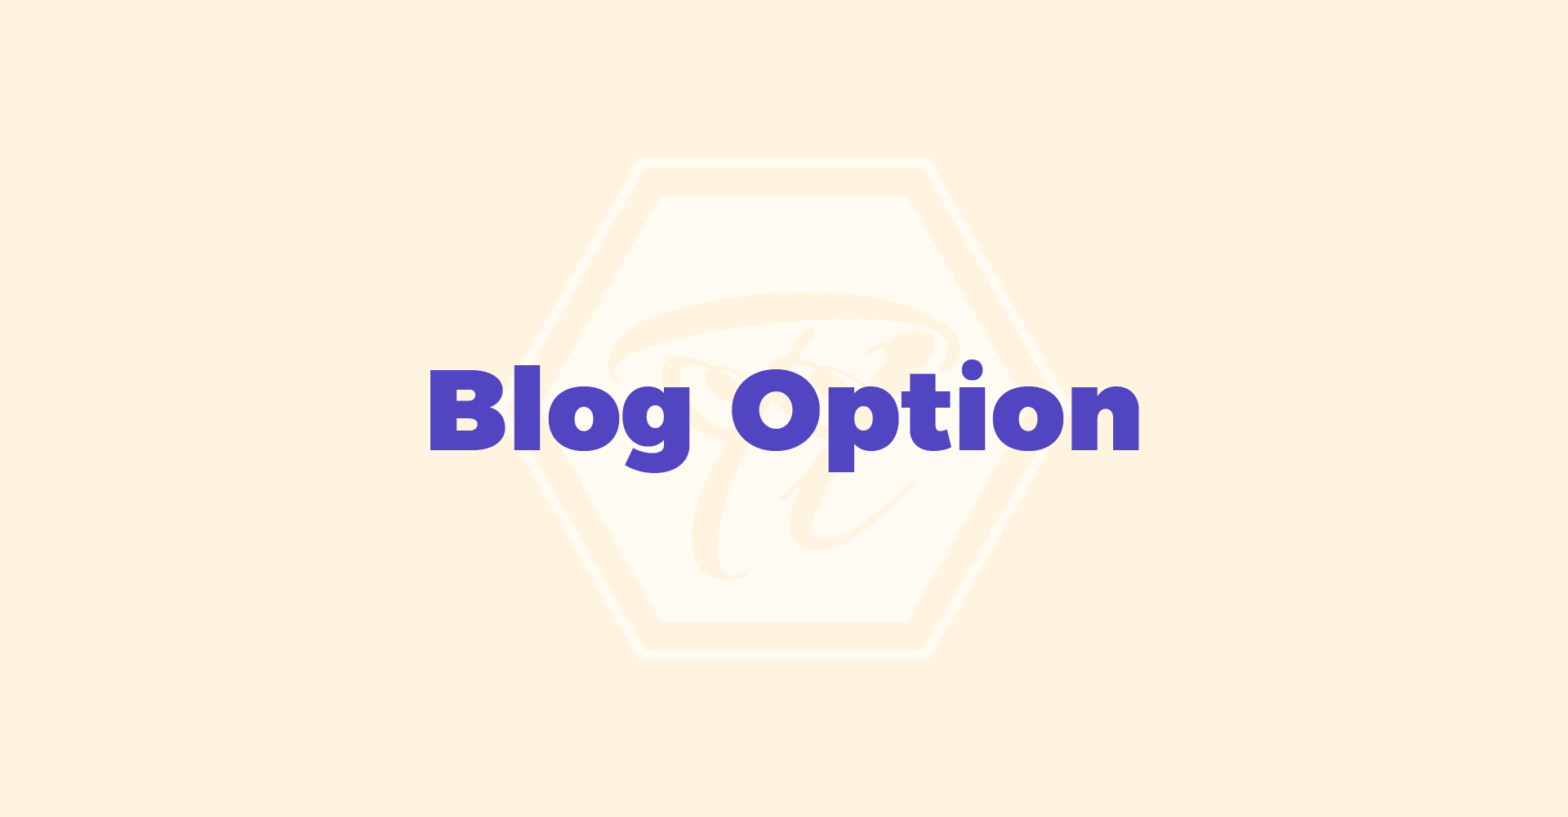 blog_option 4 1568x817